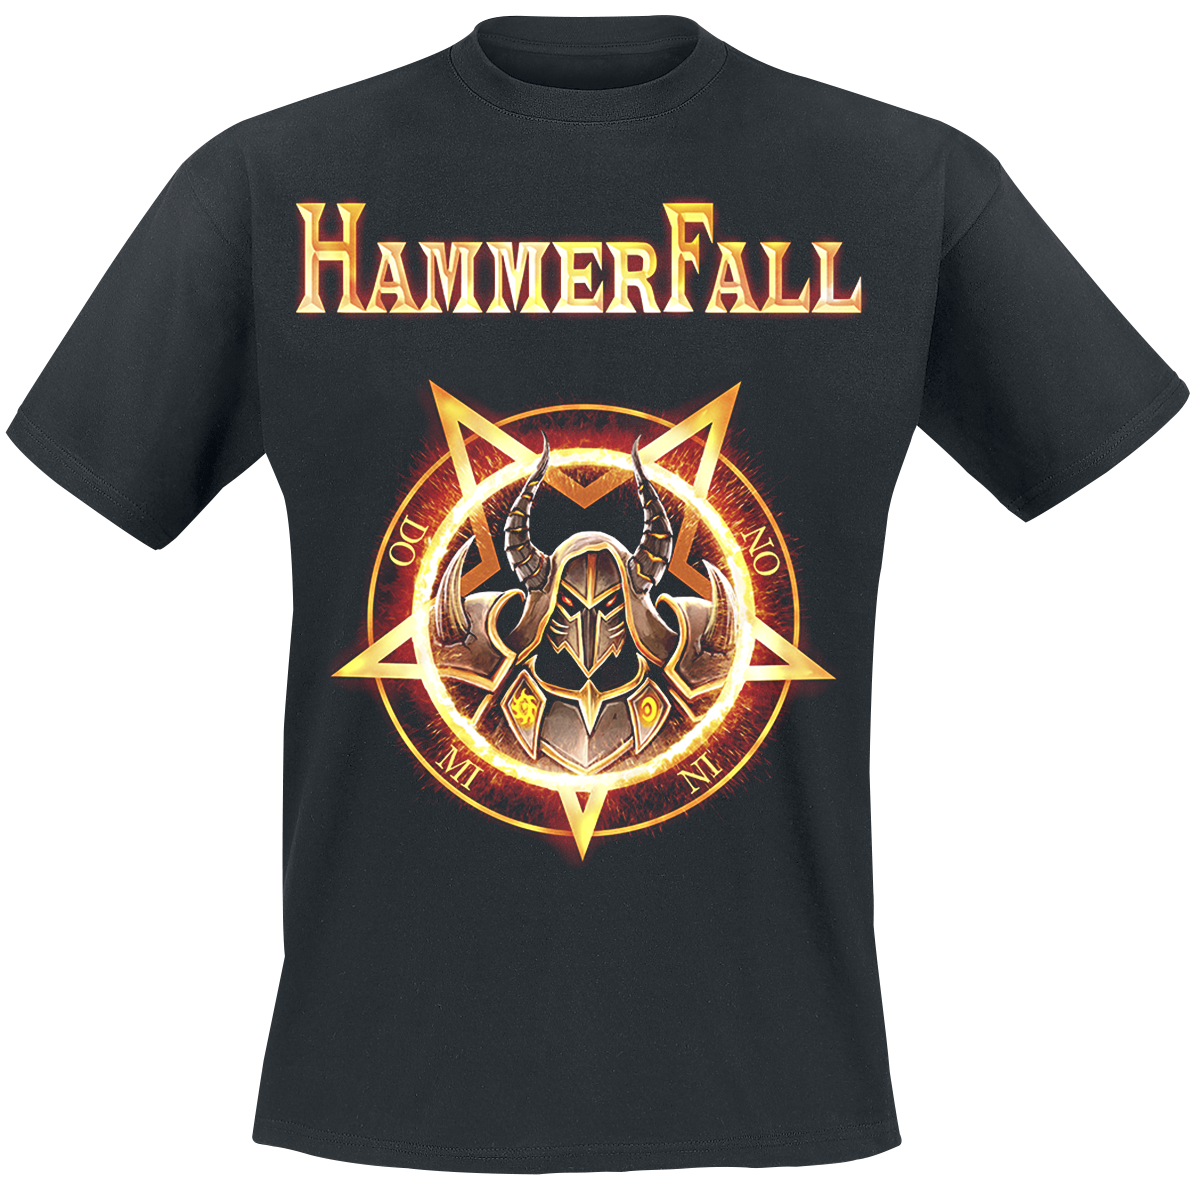 Hammerfall - Dominion - T-Shirt - black image